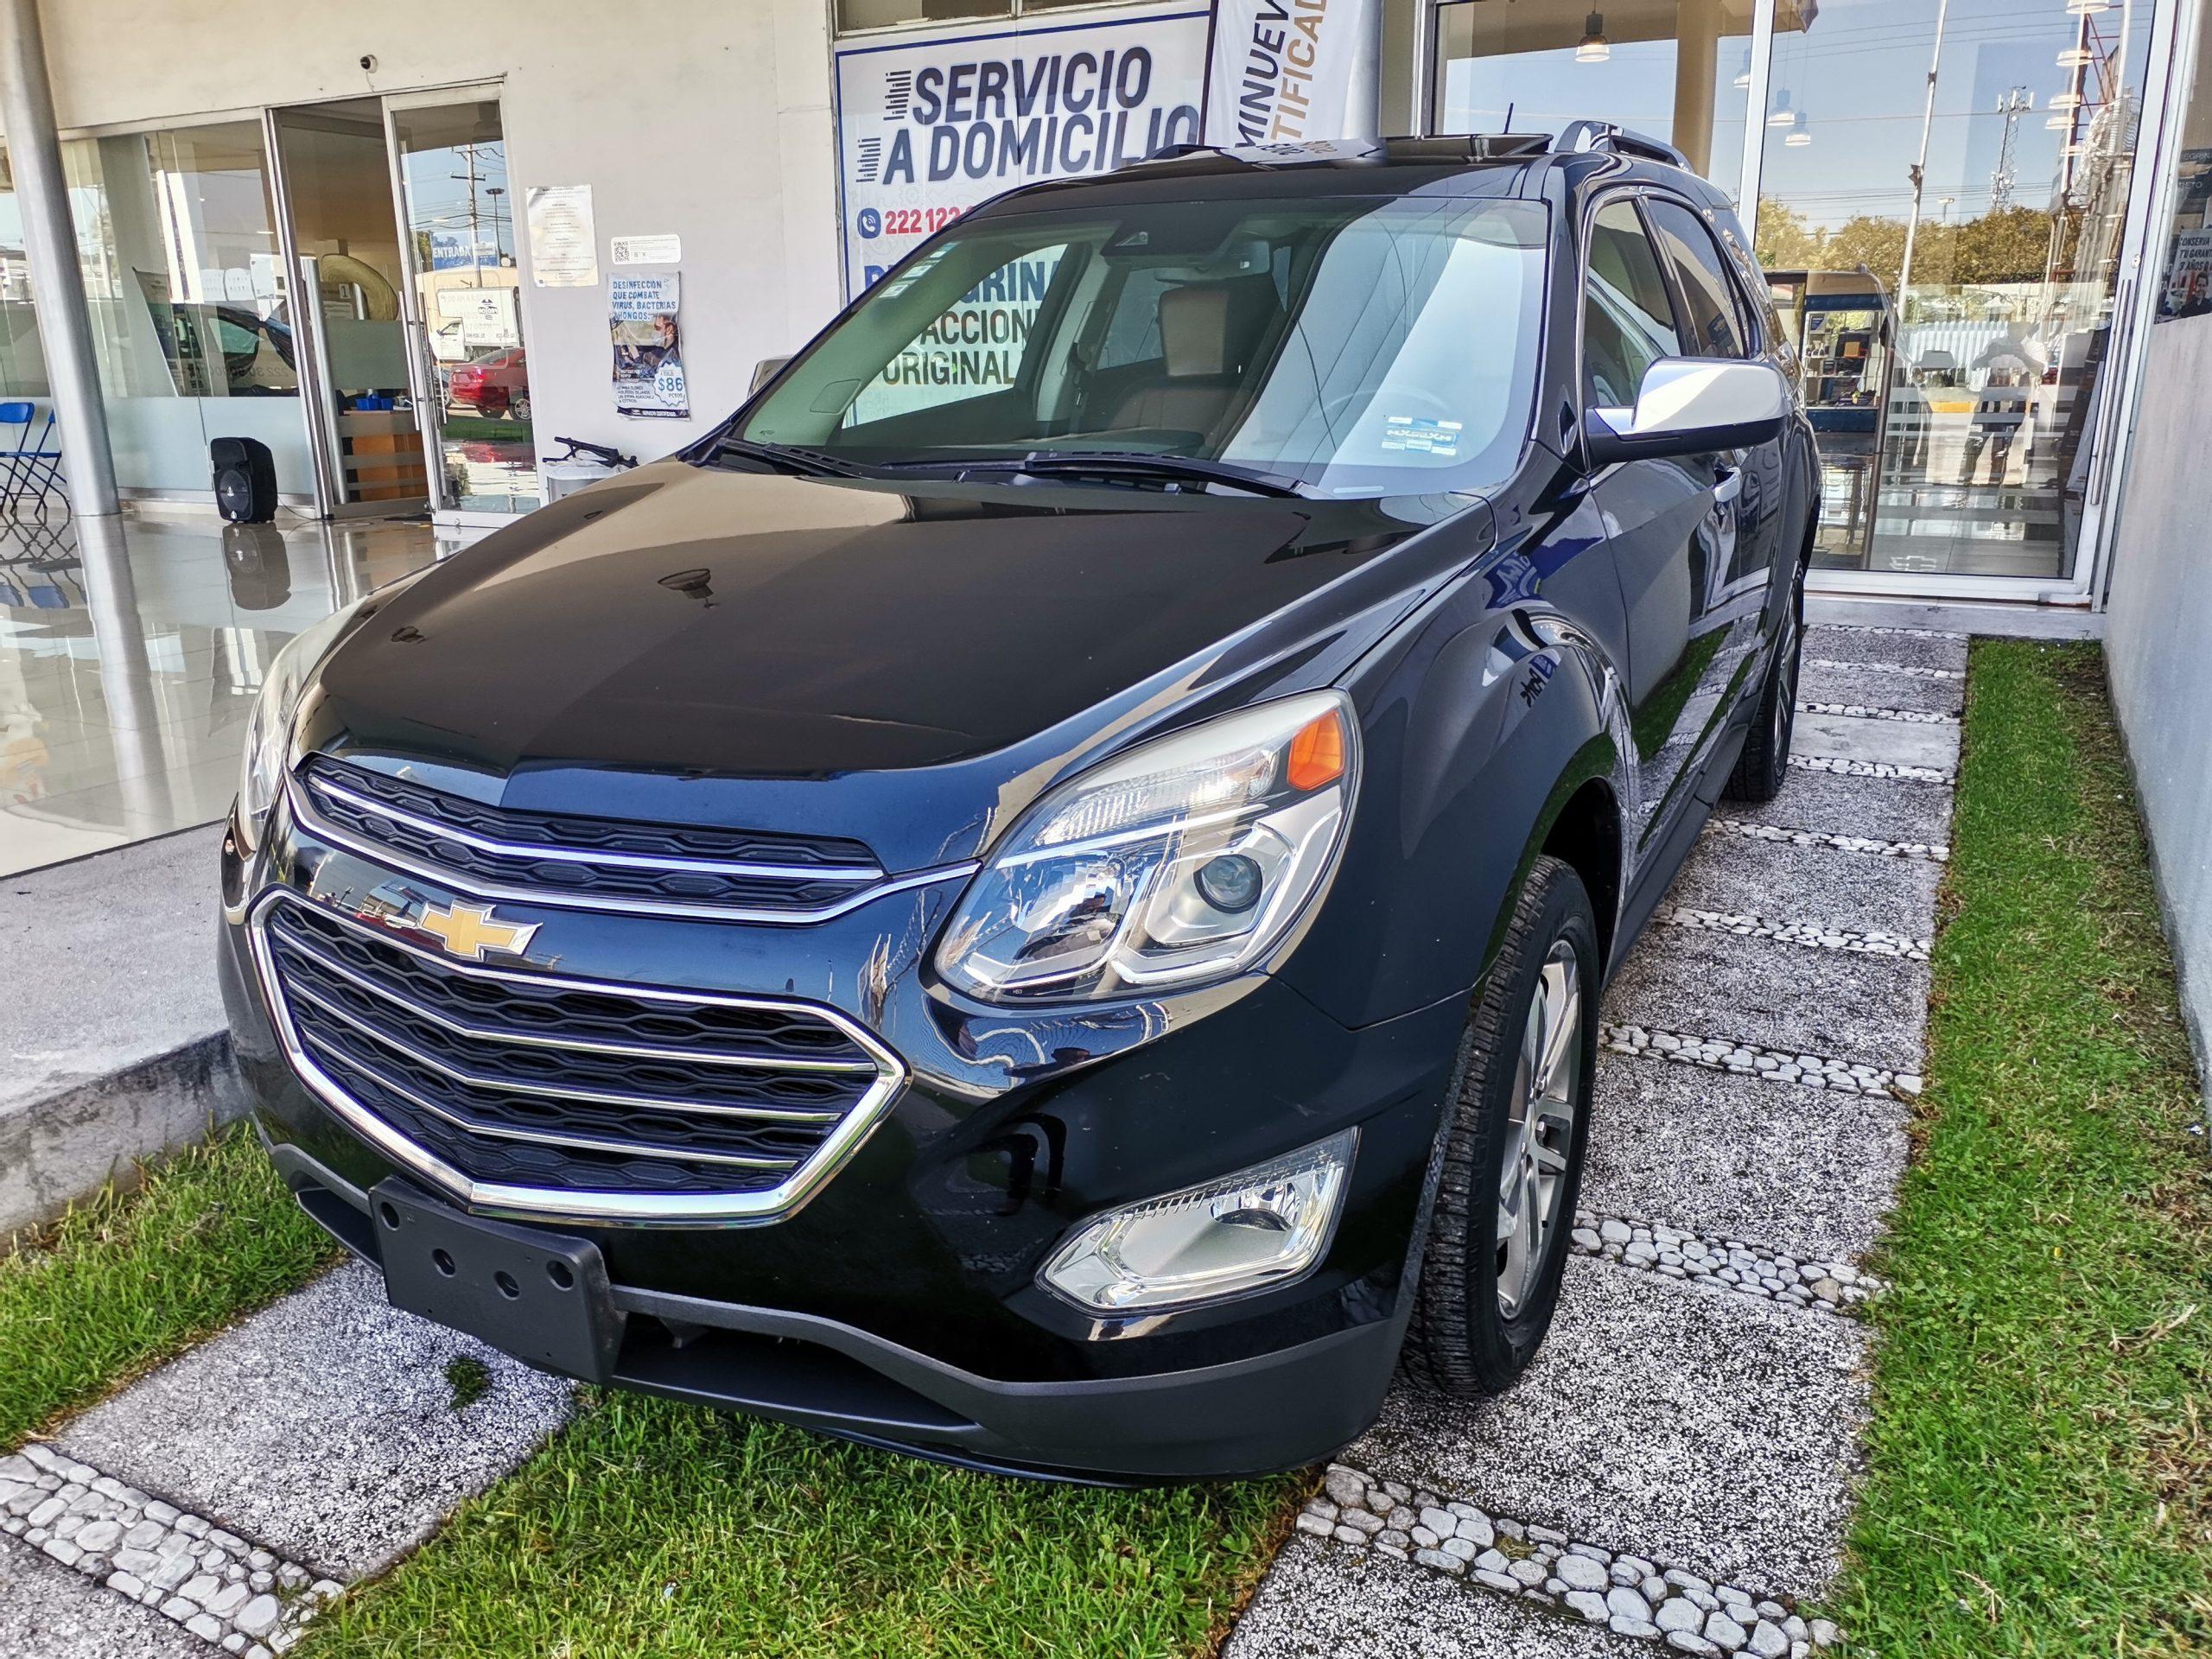 Chevrolet Equinox Premier Color Negro 2017 At